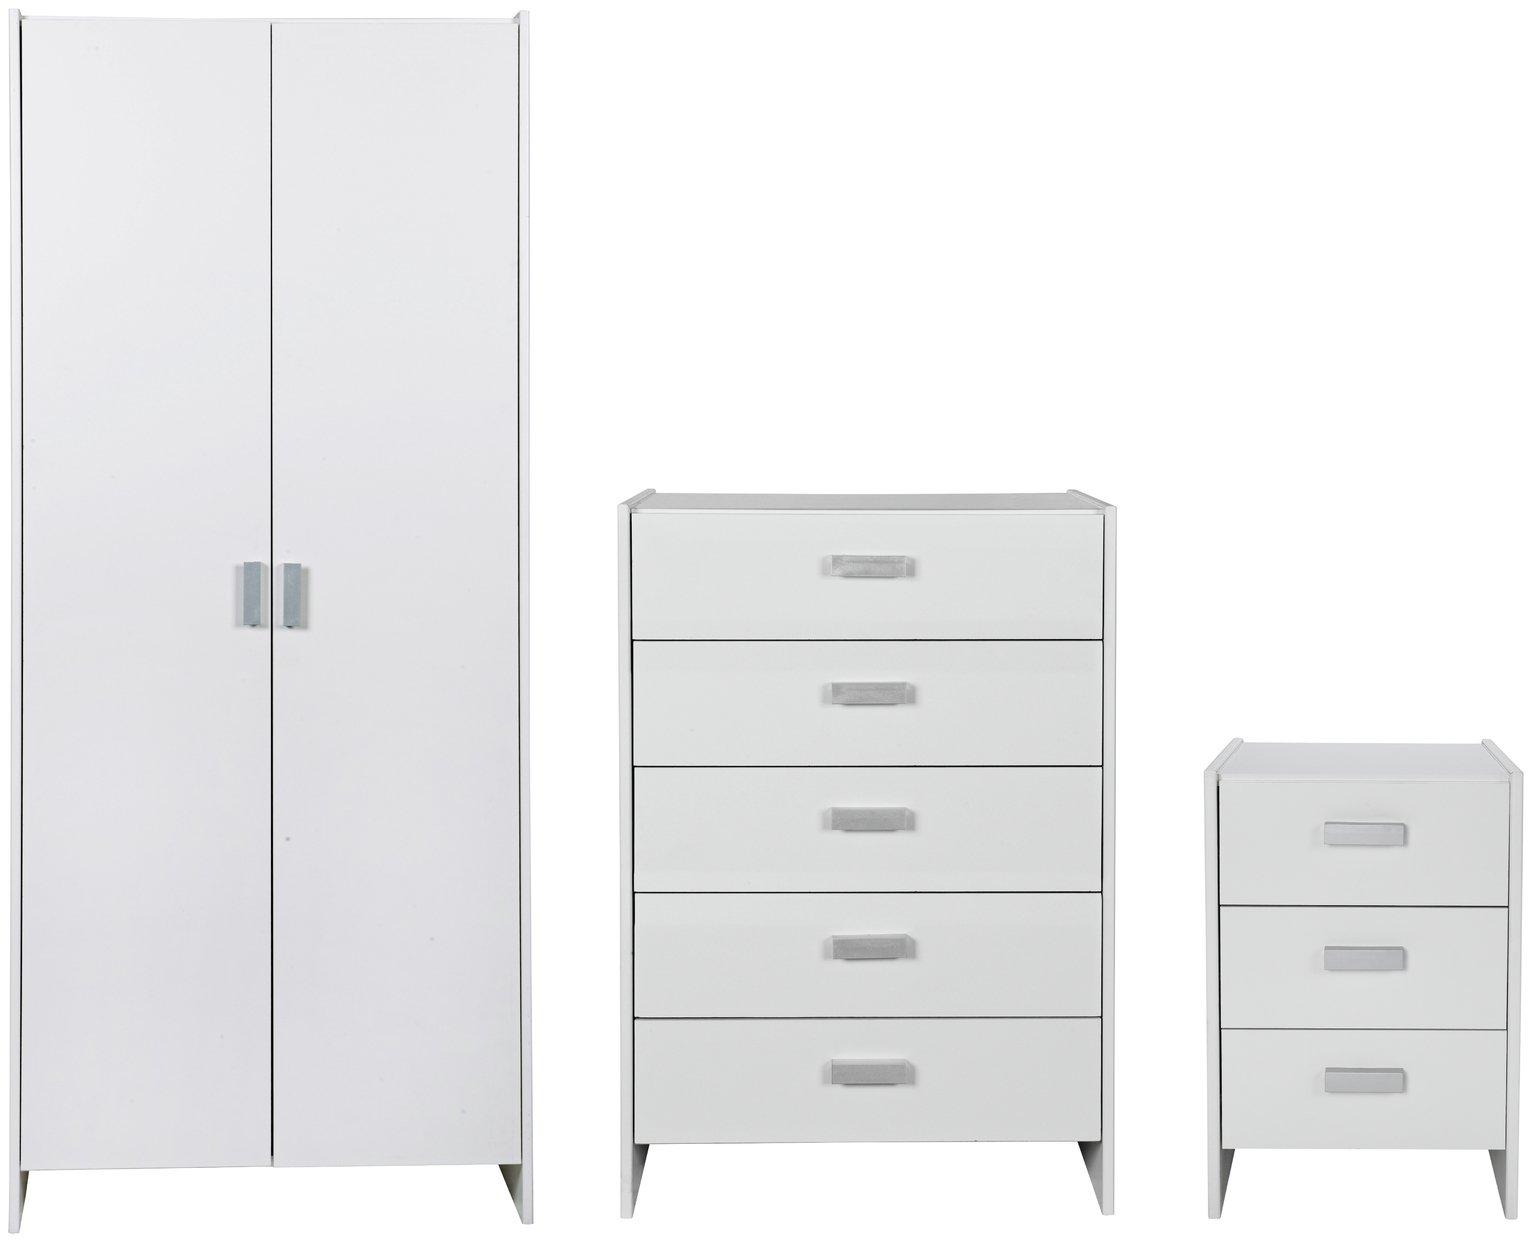 HOME Capella 3 Piece 2 Door Wardrobe Package - White